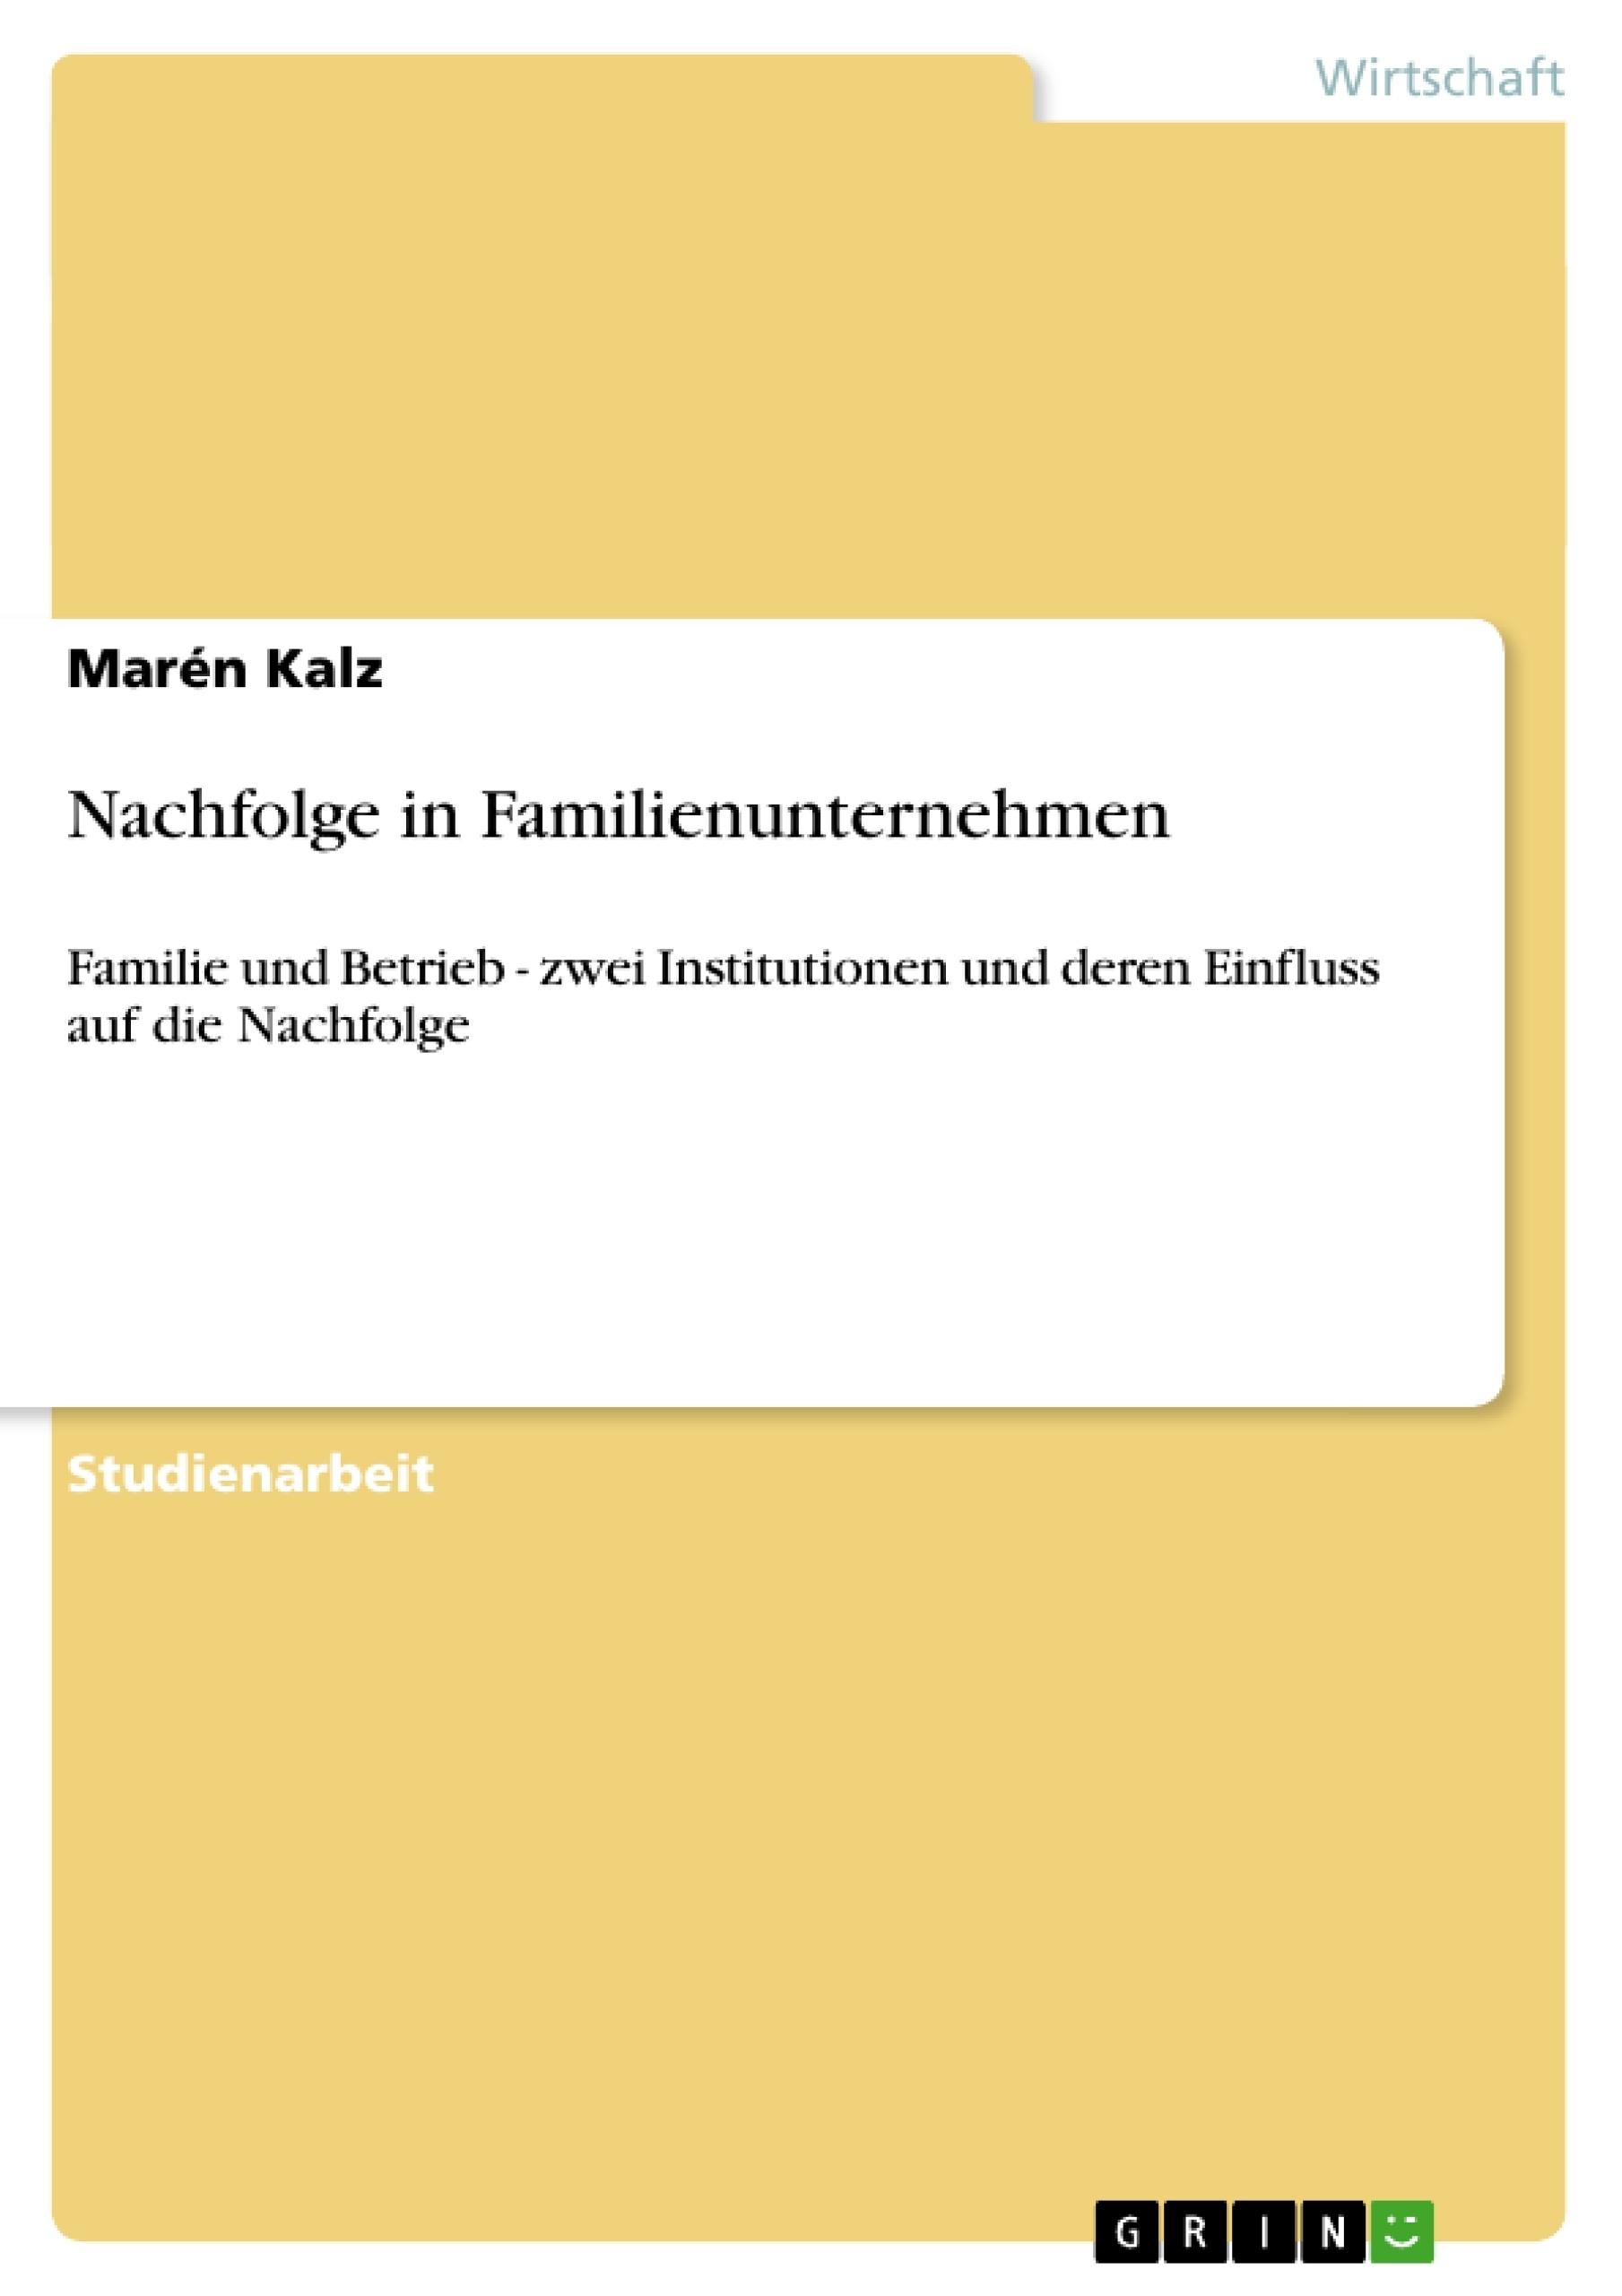 Titel: Nachfolge in Familienunternehmen